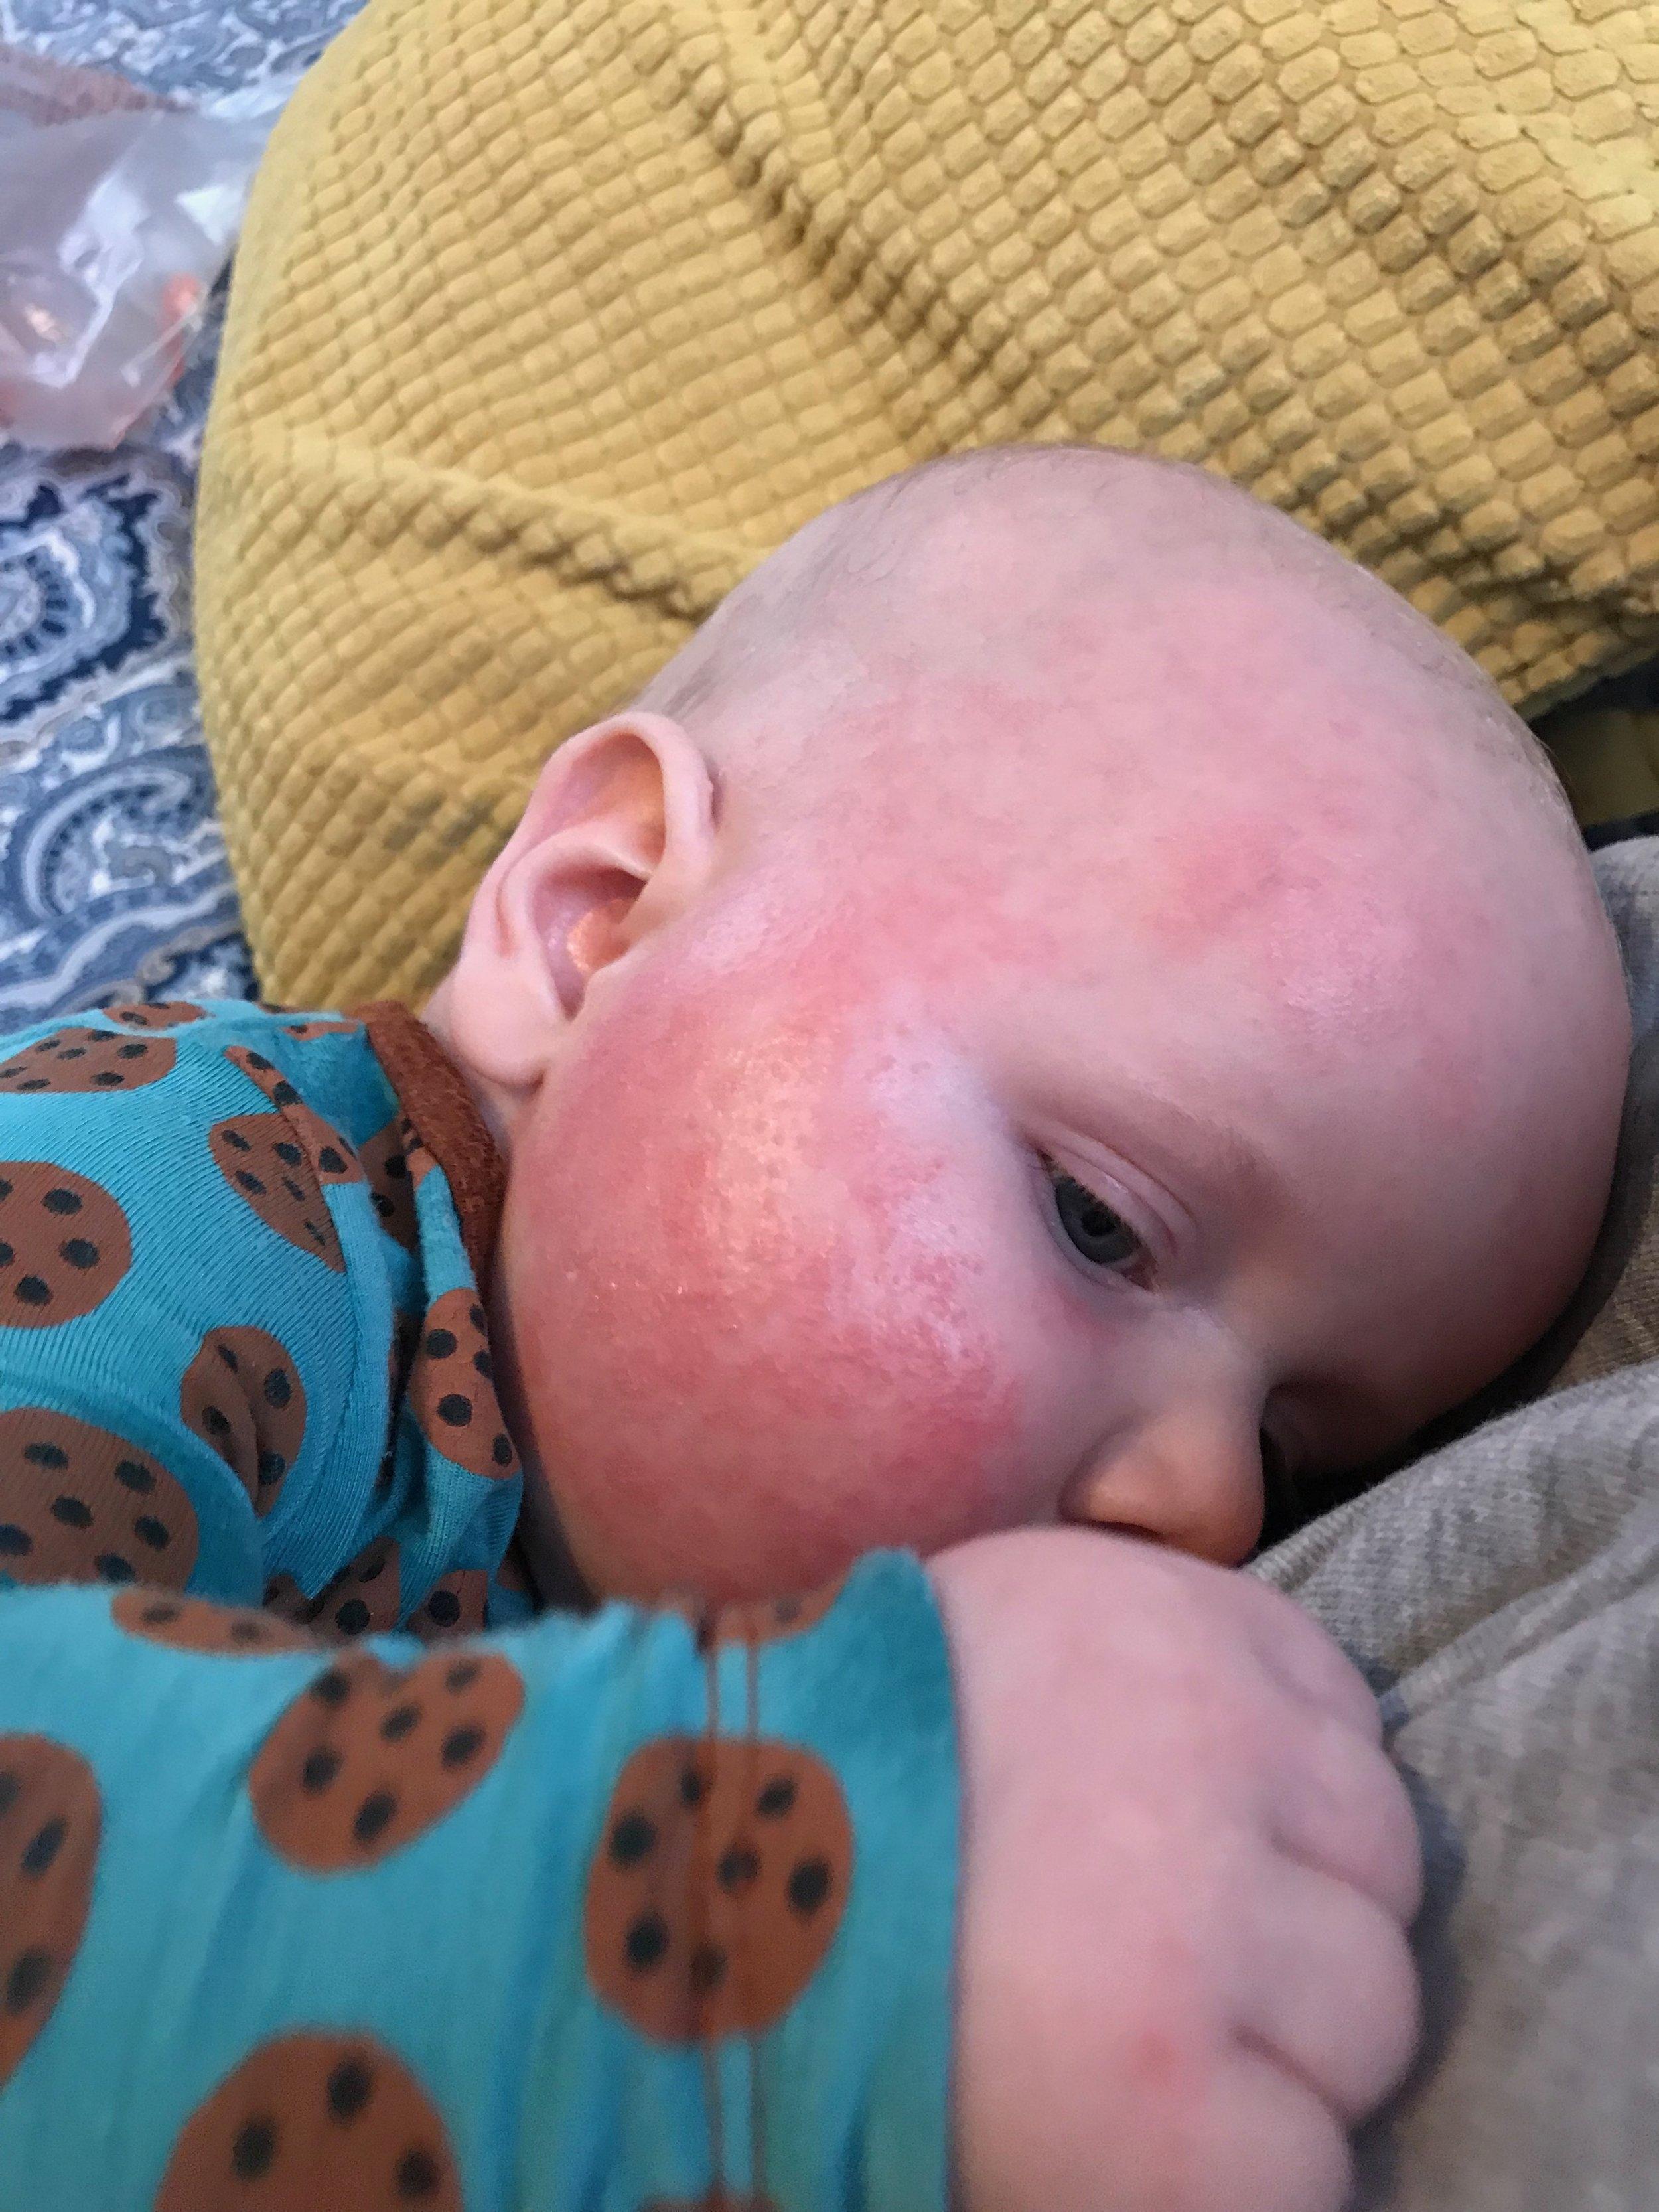 baby face rash